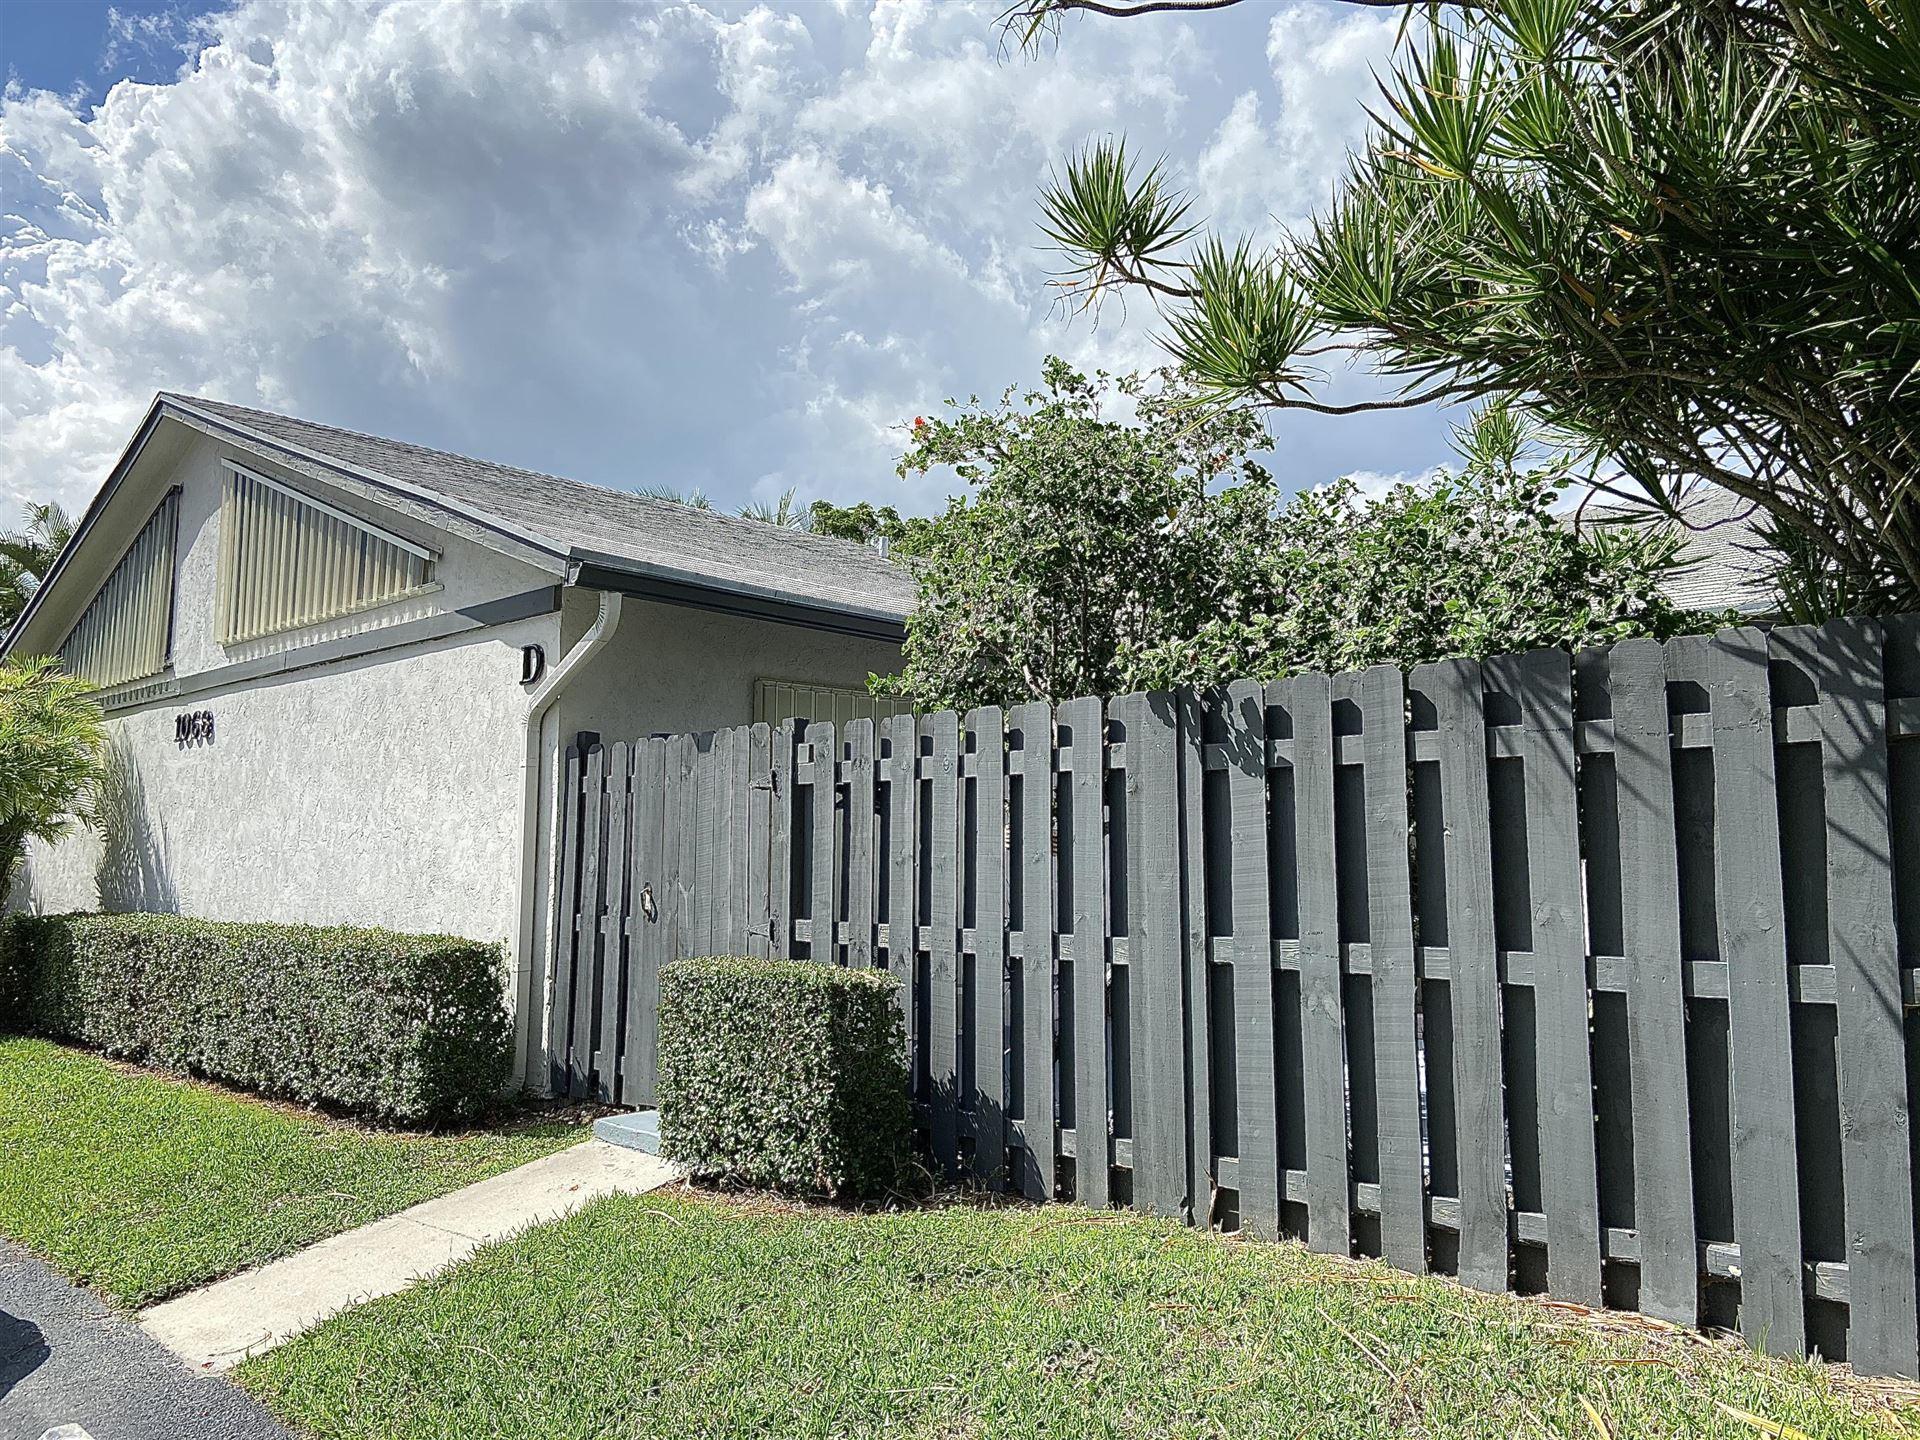 Photo of 1068 Summit Trail Circle #D, West Palm Beach, FL 33415 (MLS # RX-10656793)